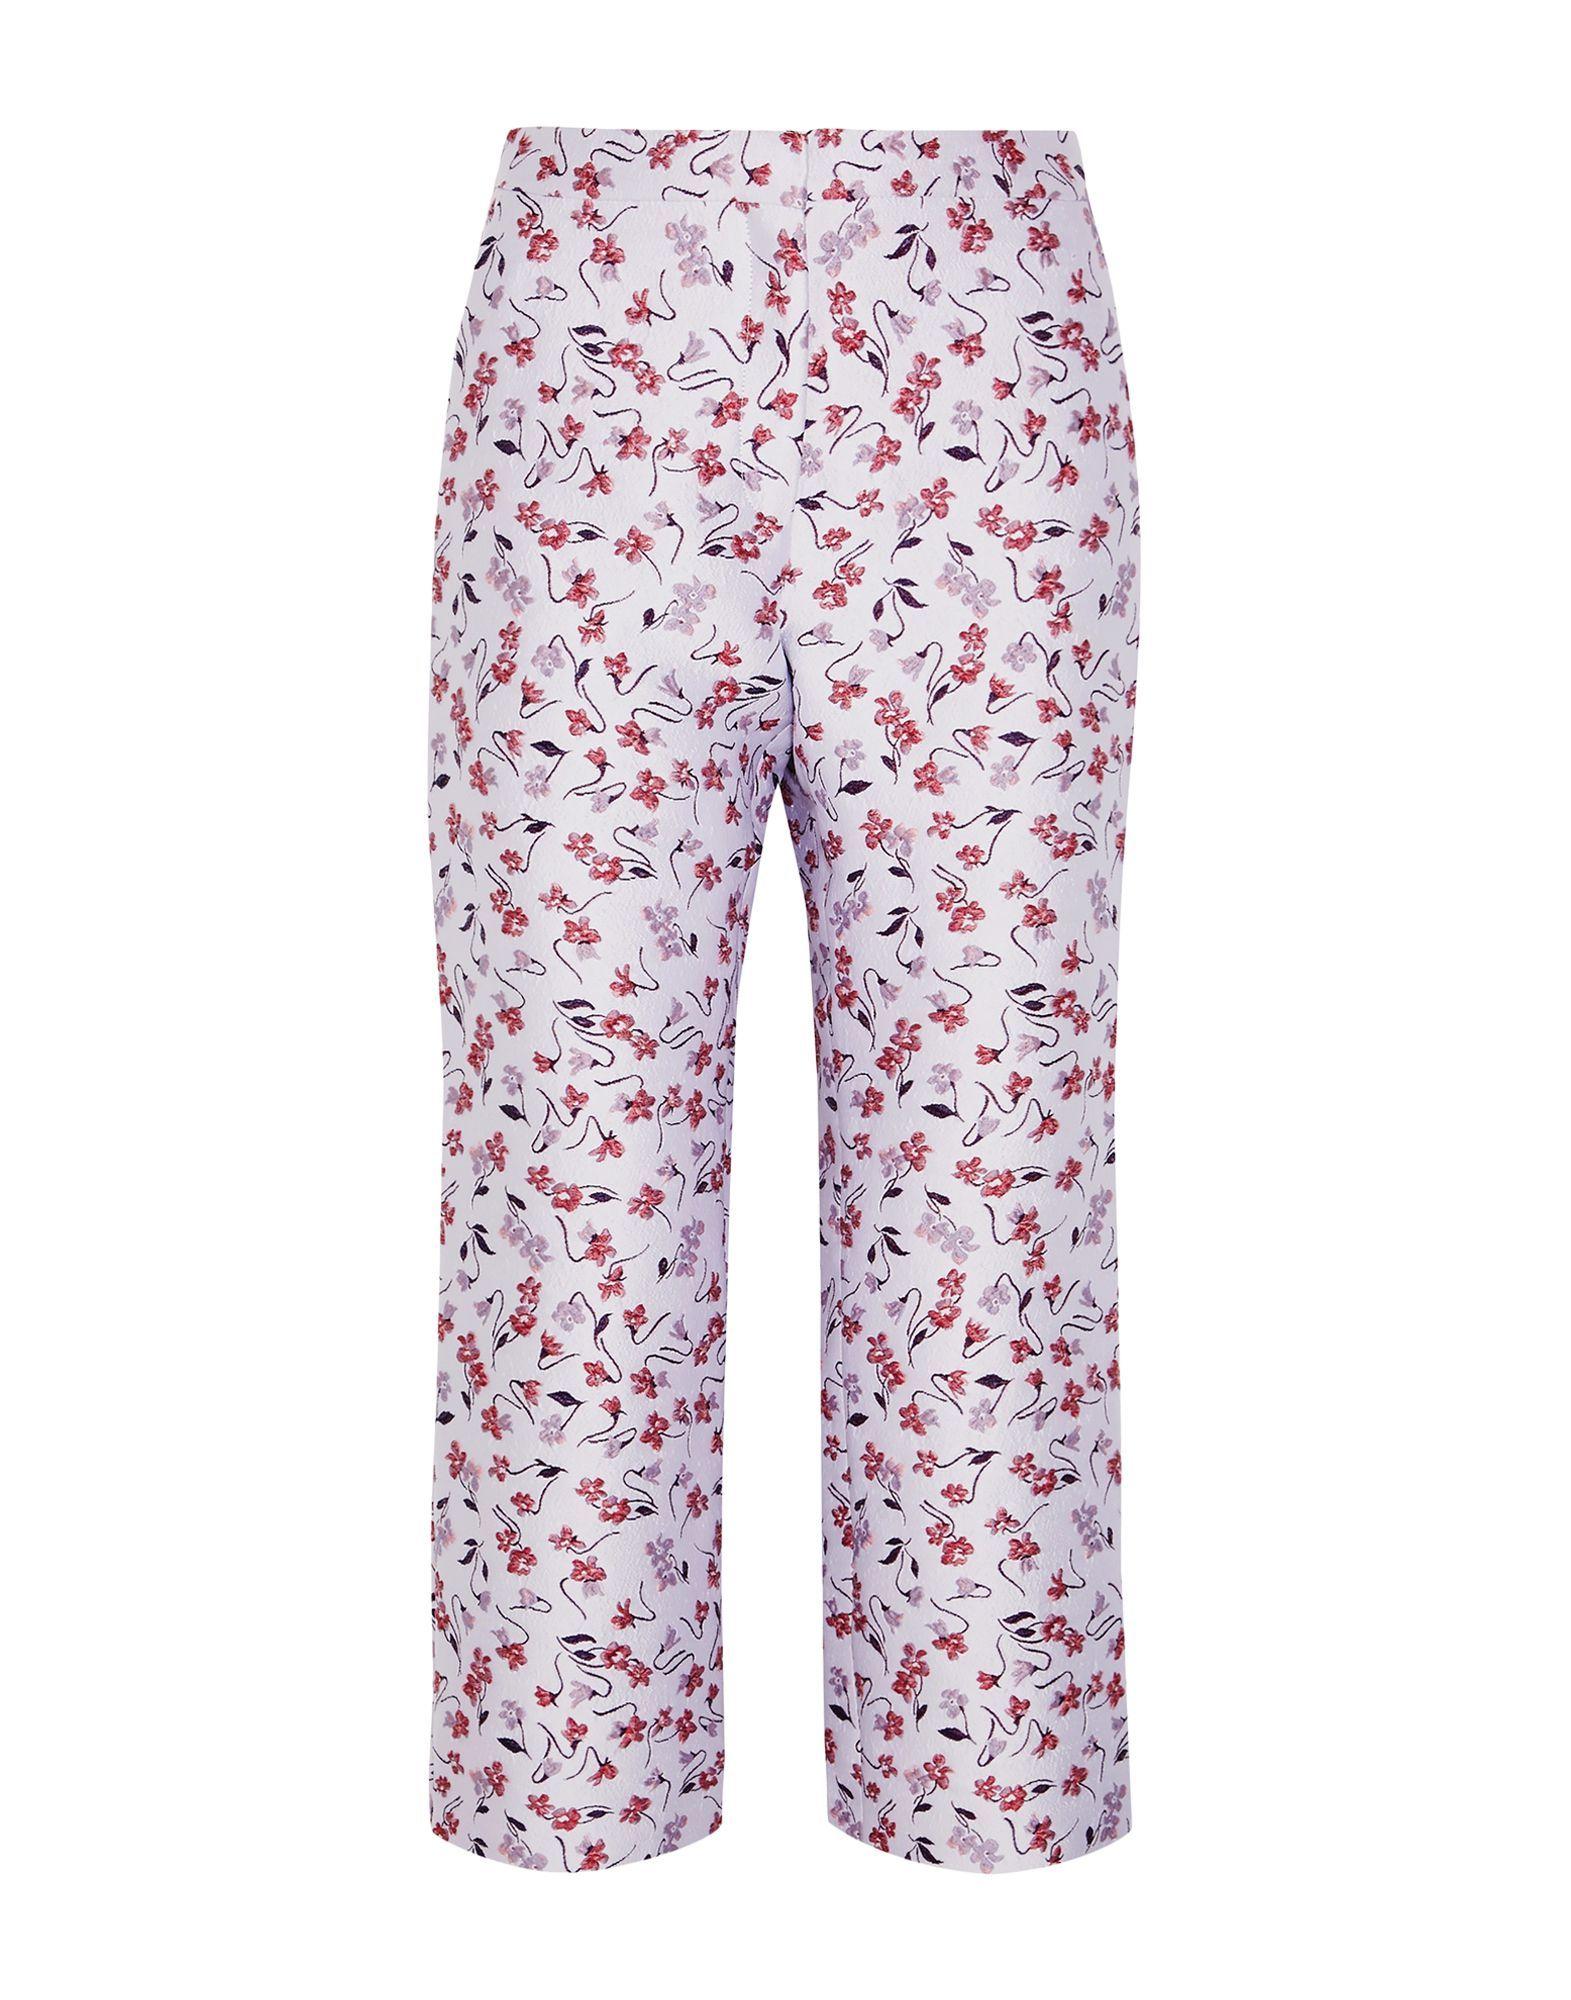 Altuzarra Lilac Floral Jacquard Tailored Trousers